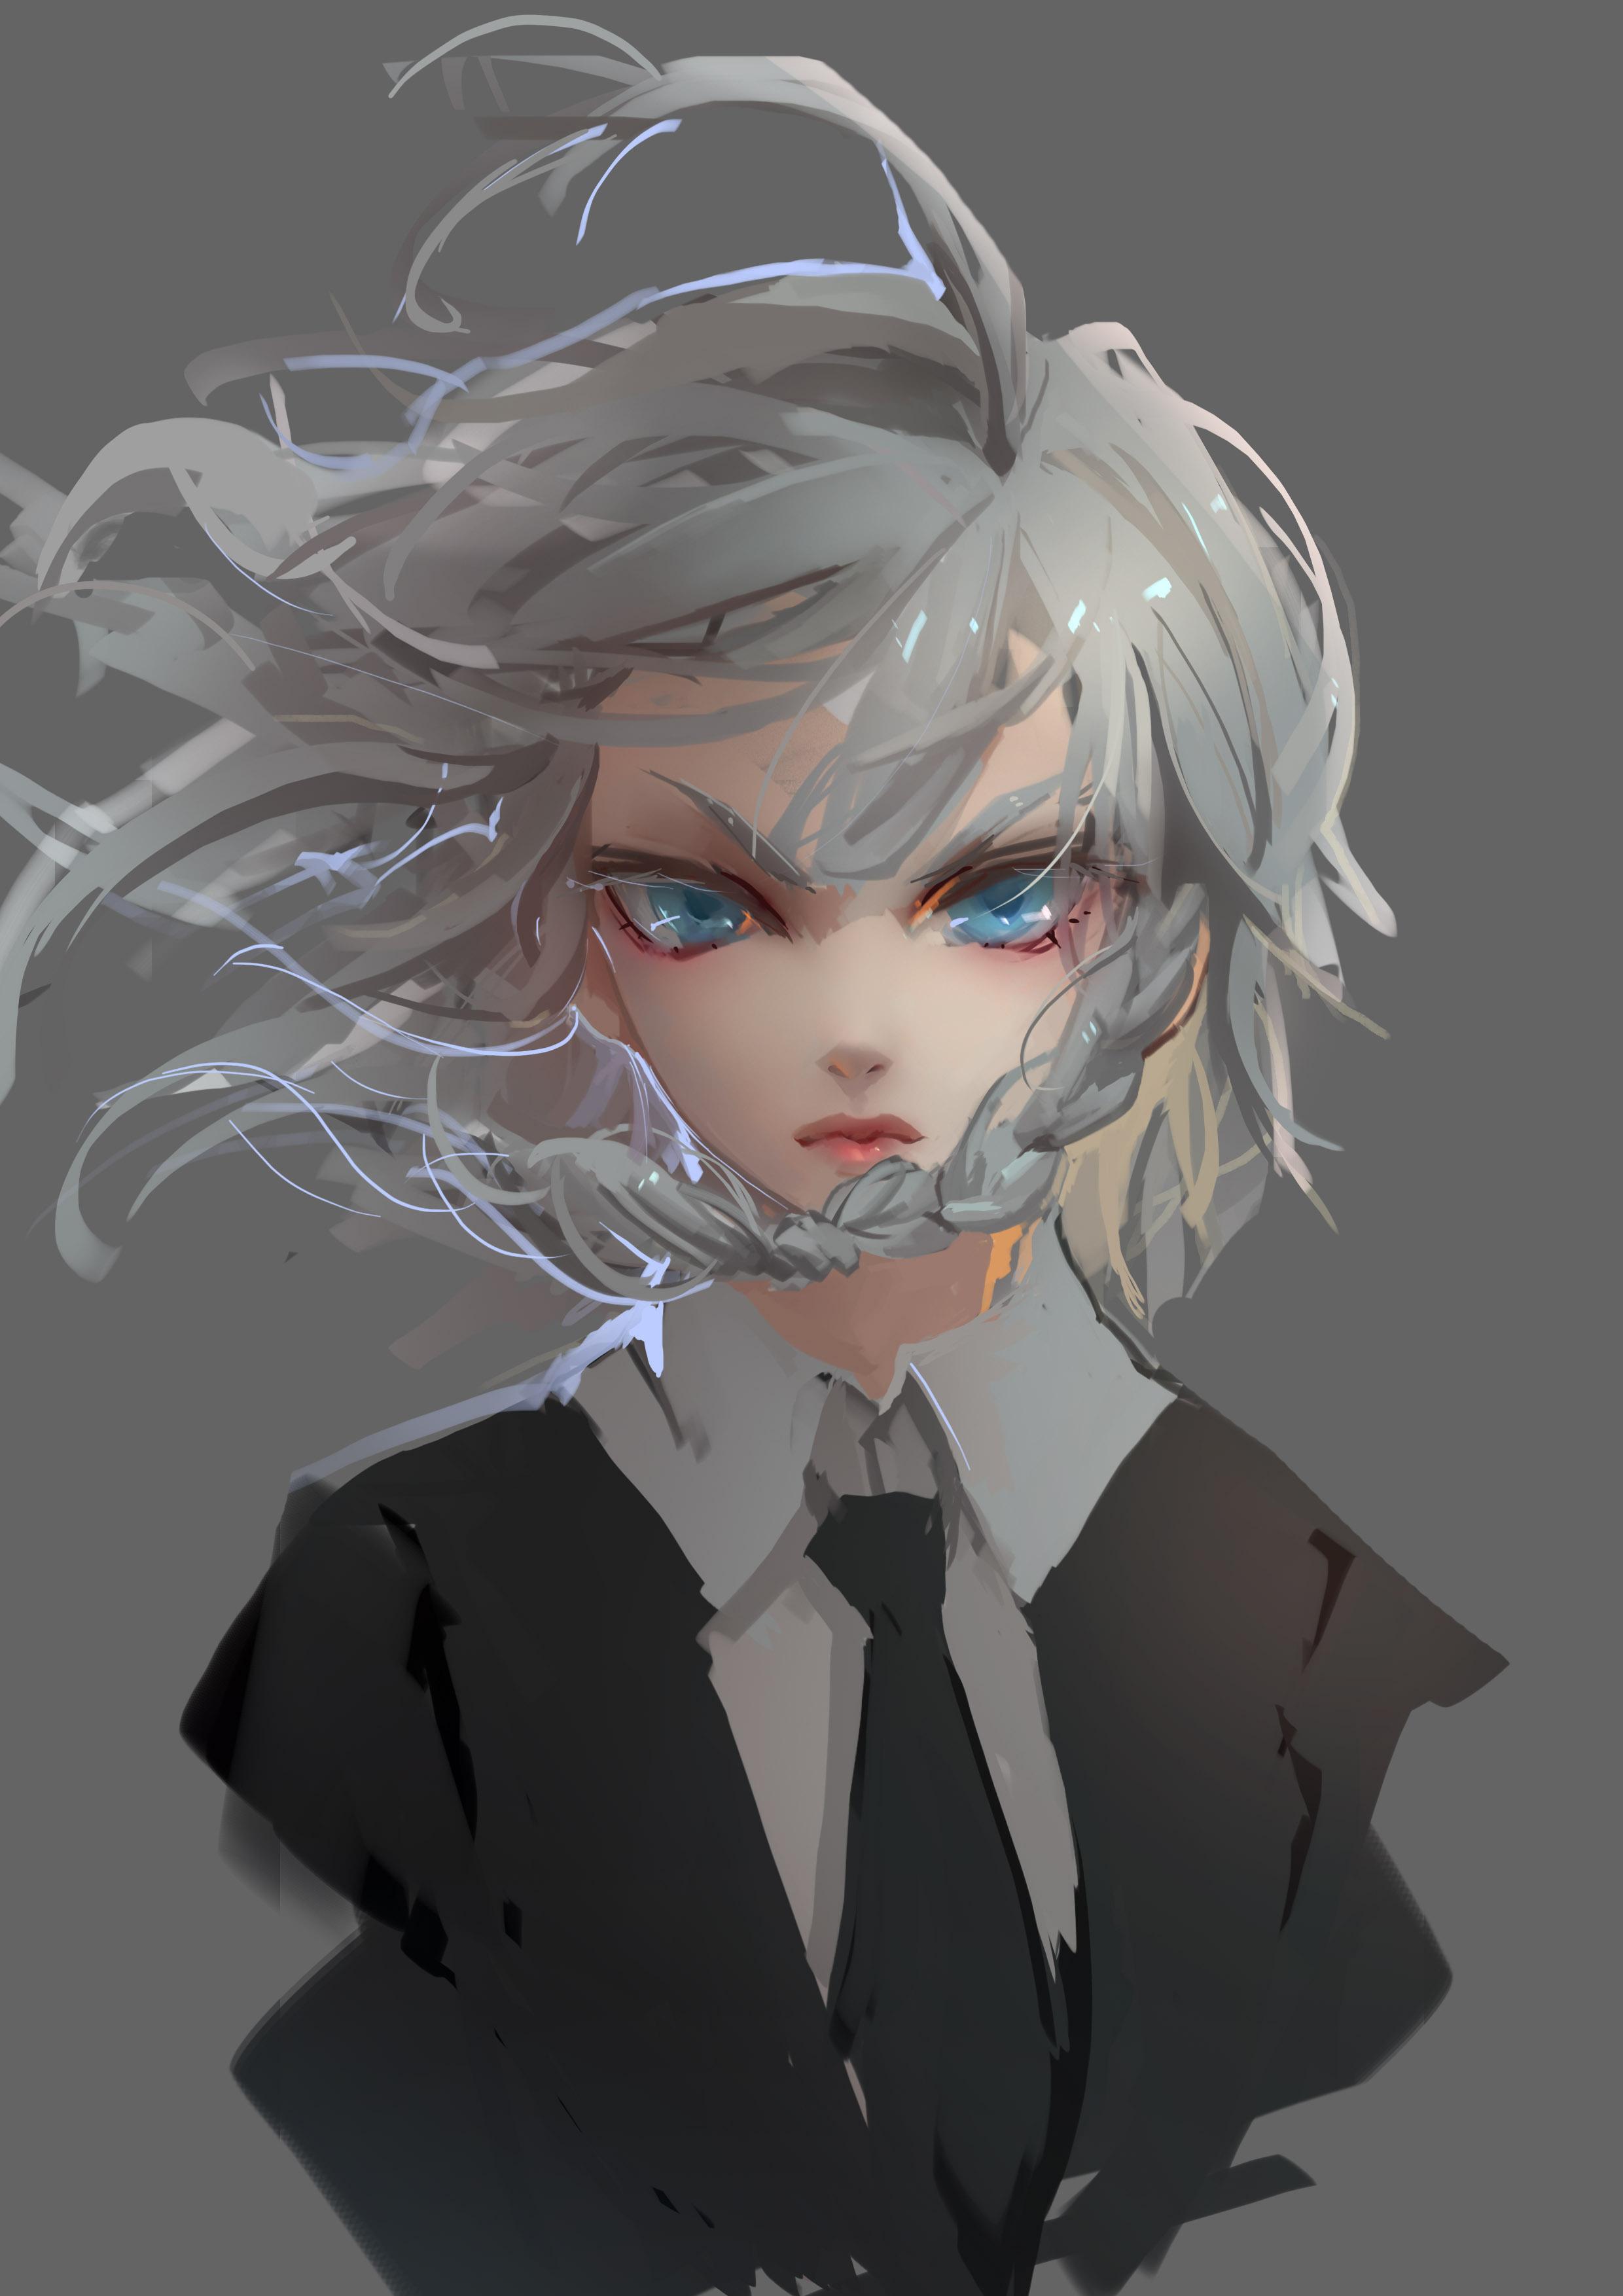 https://files.catbox.moe/min786.jpg